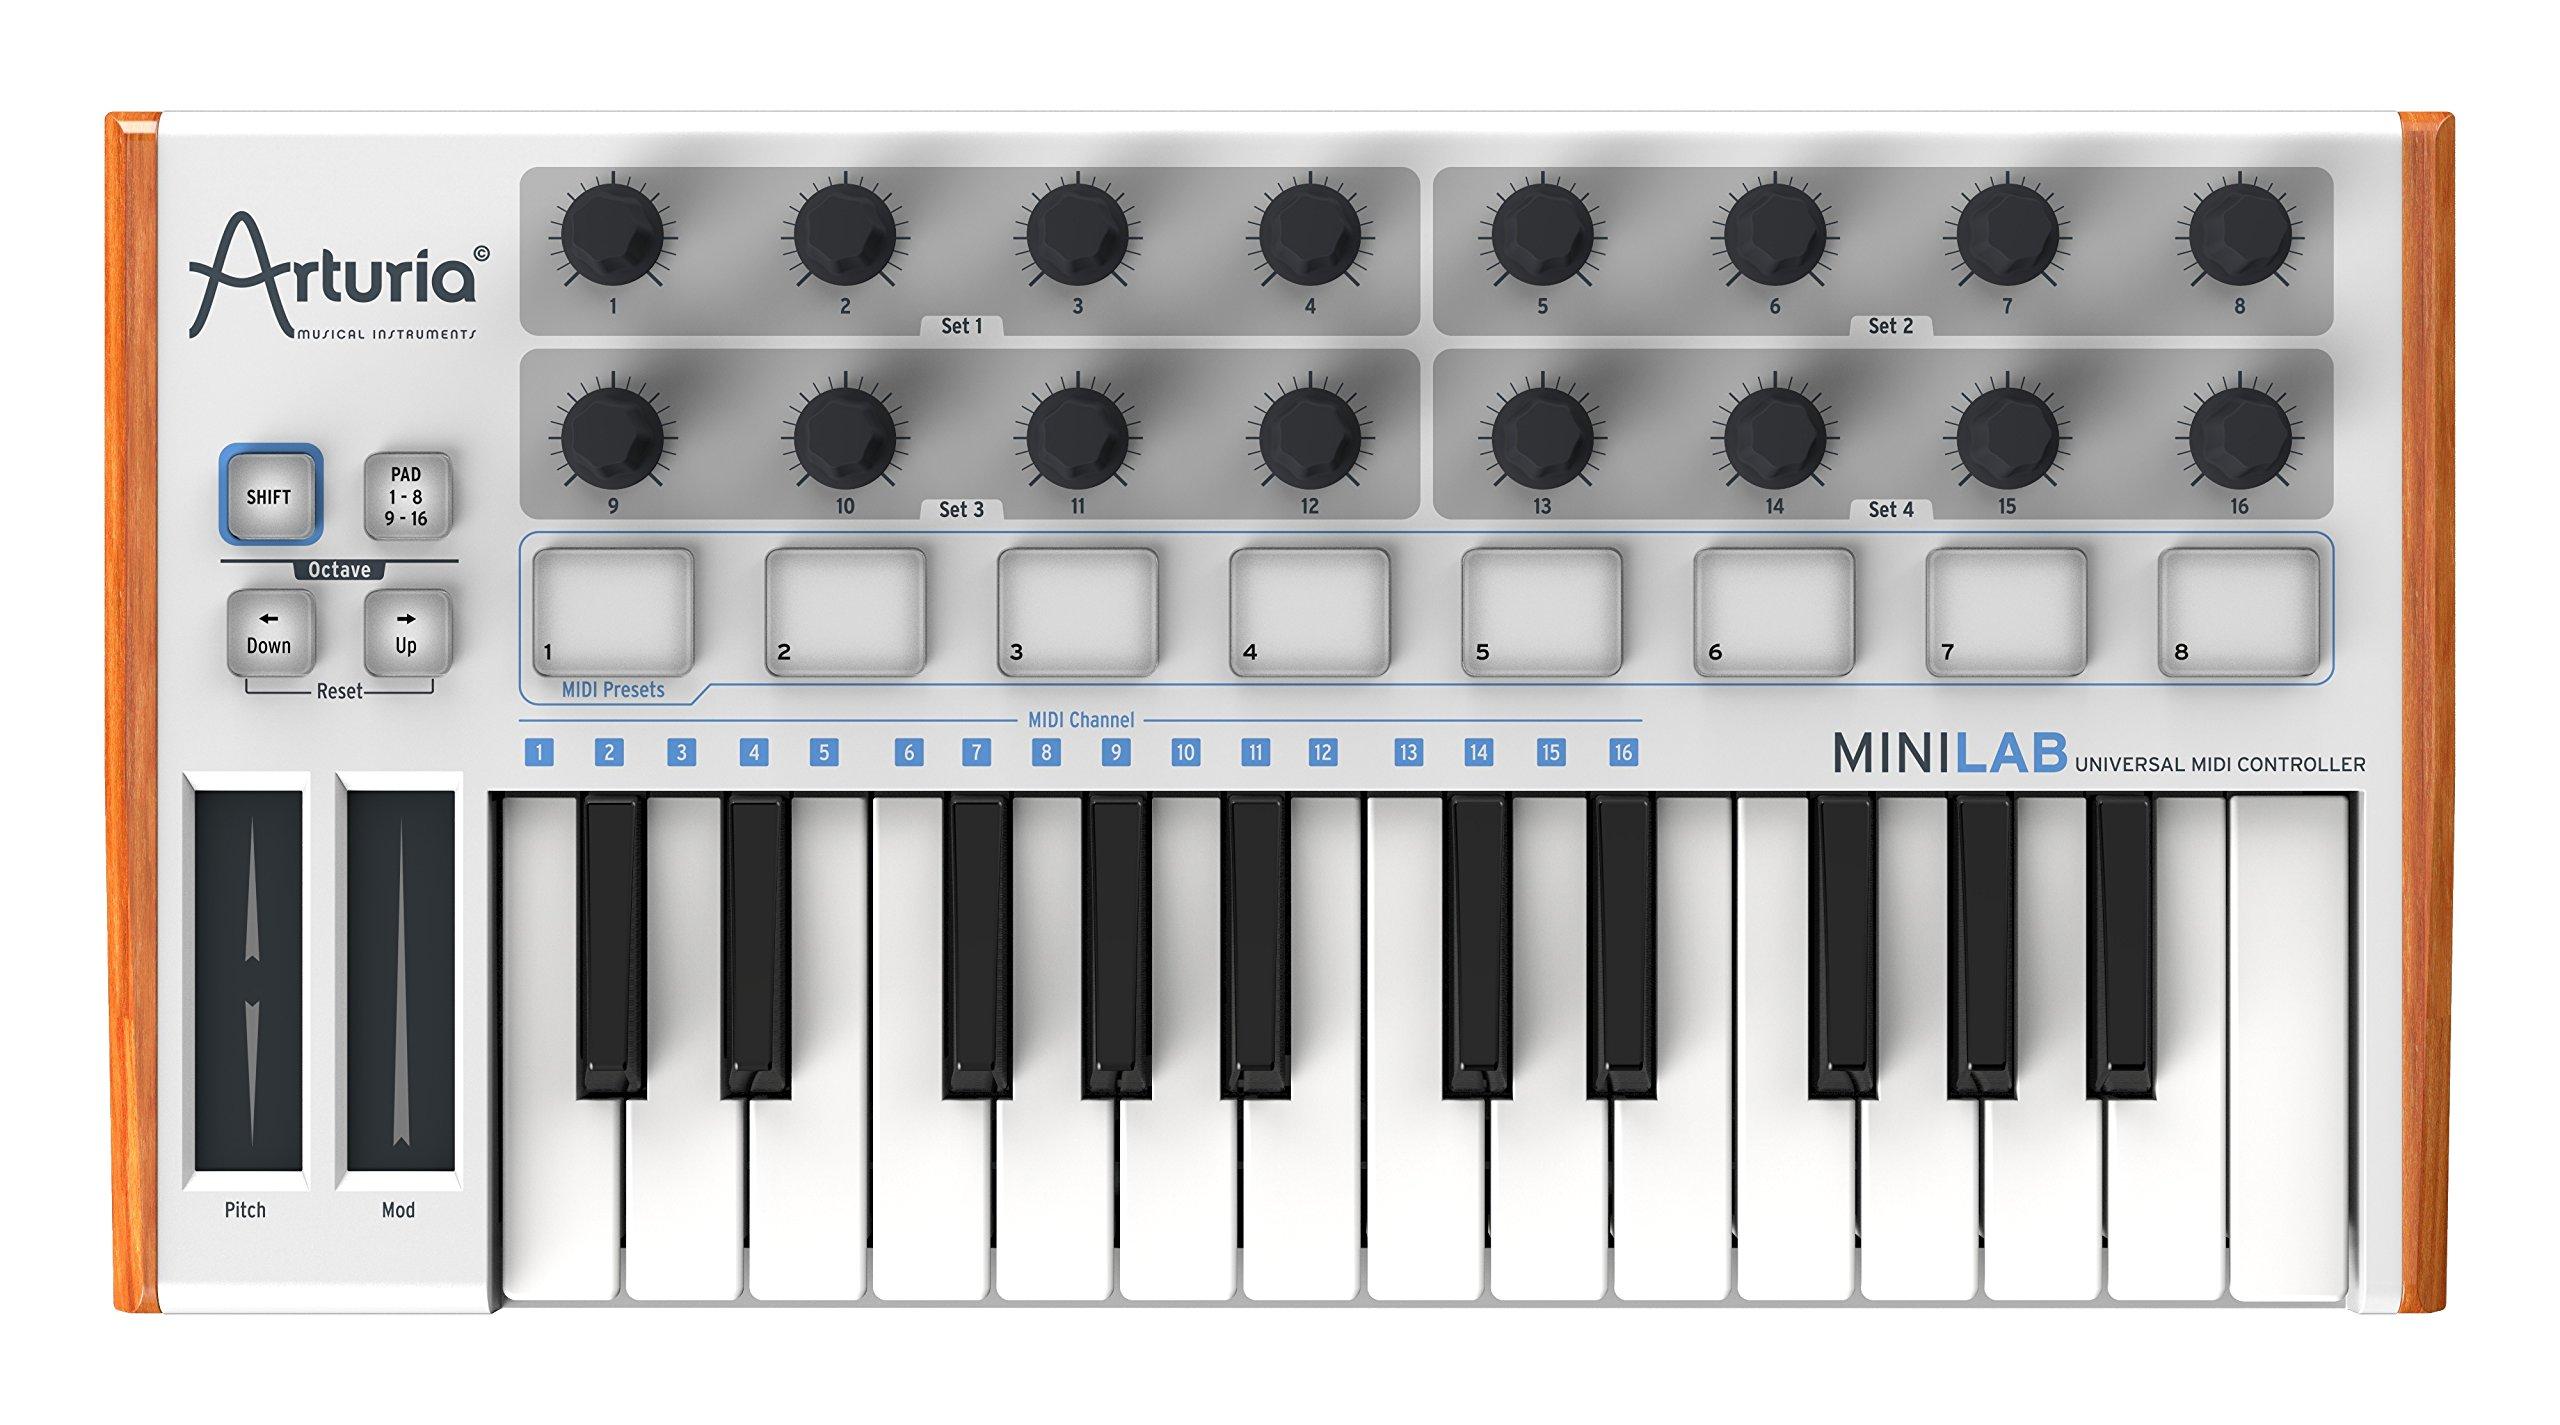 Arturia MiniLab 230401 25-Key Mini USB/MIDI Keyboard Controller with Software